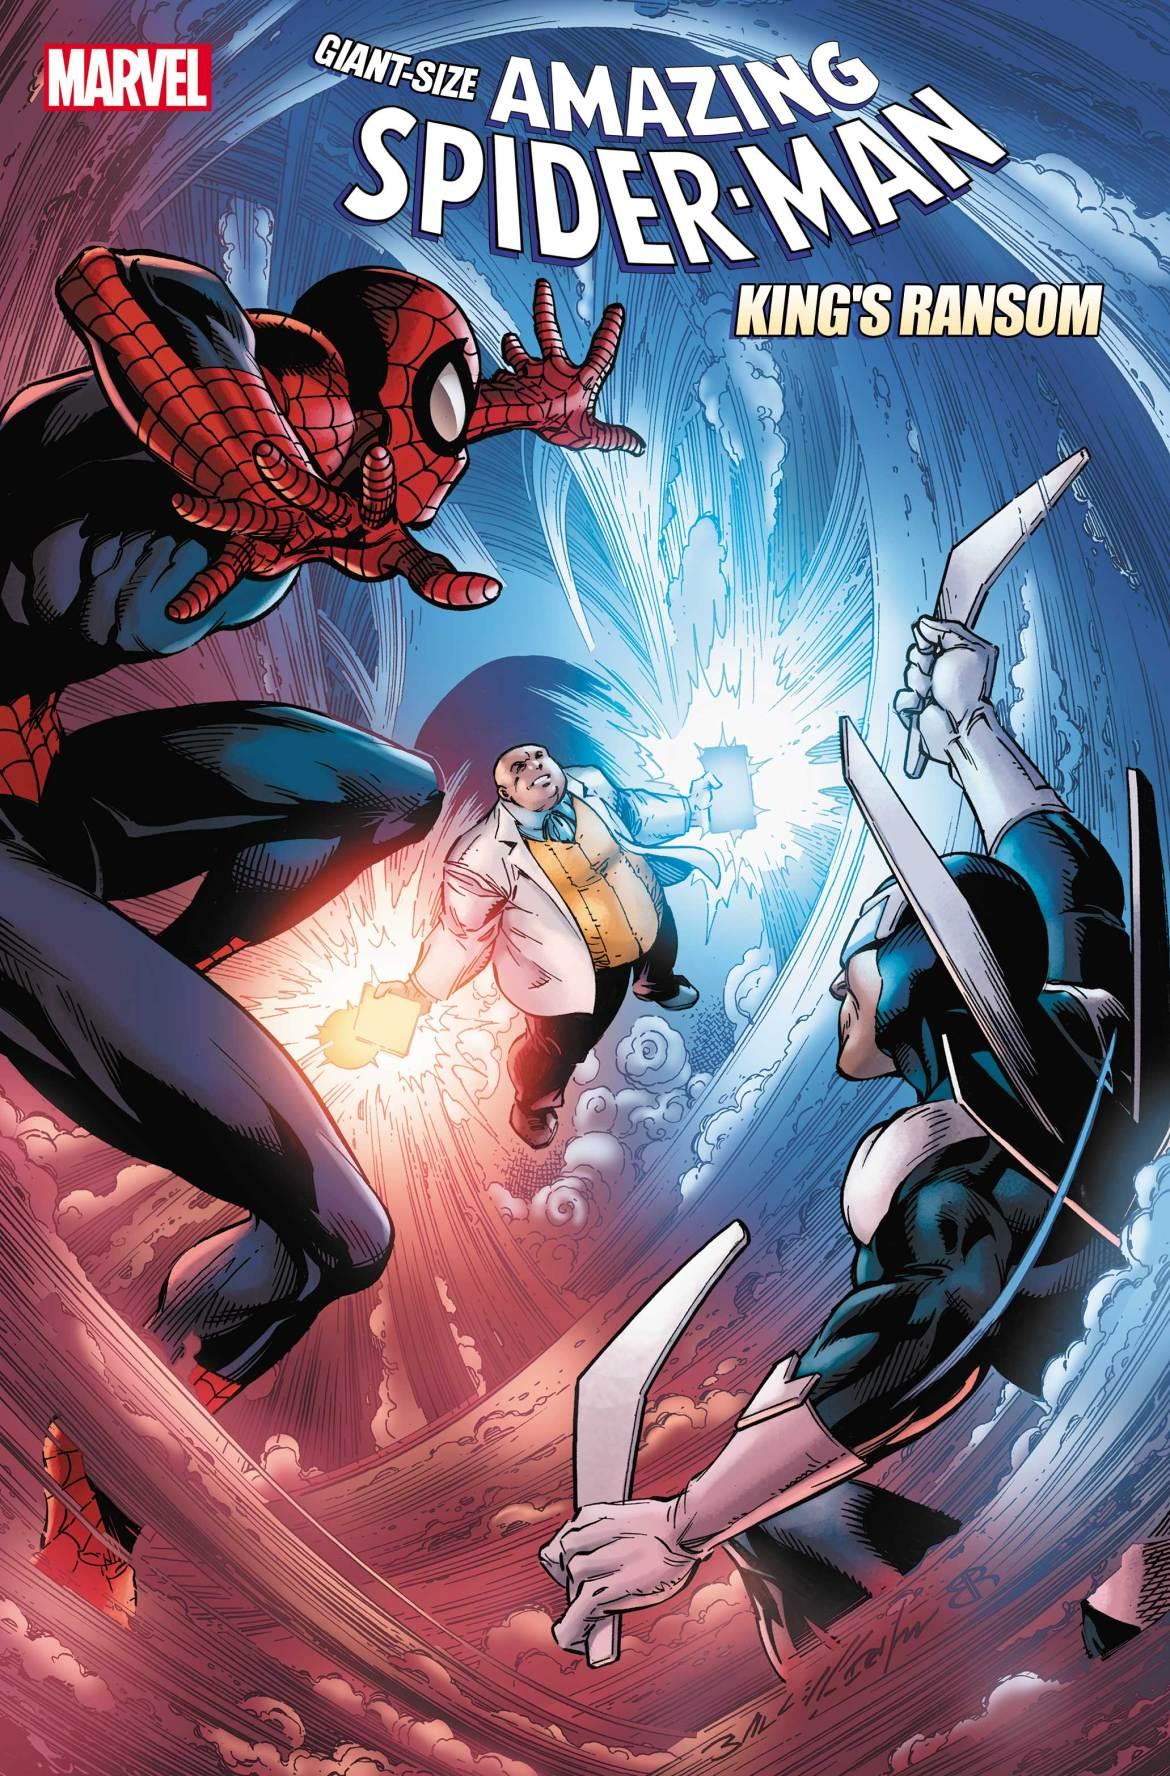 GSASMKINGR2021001_Cover-1 Marvel Comics May 2021 Solicitations